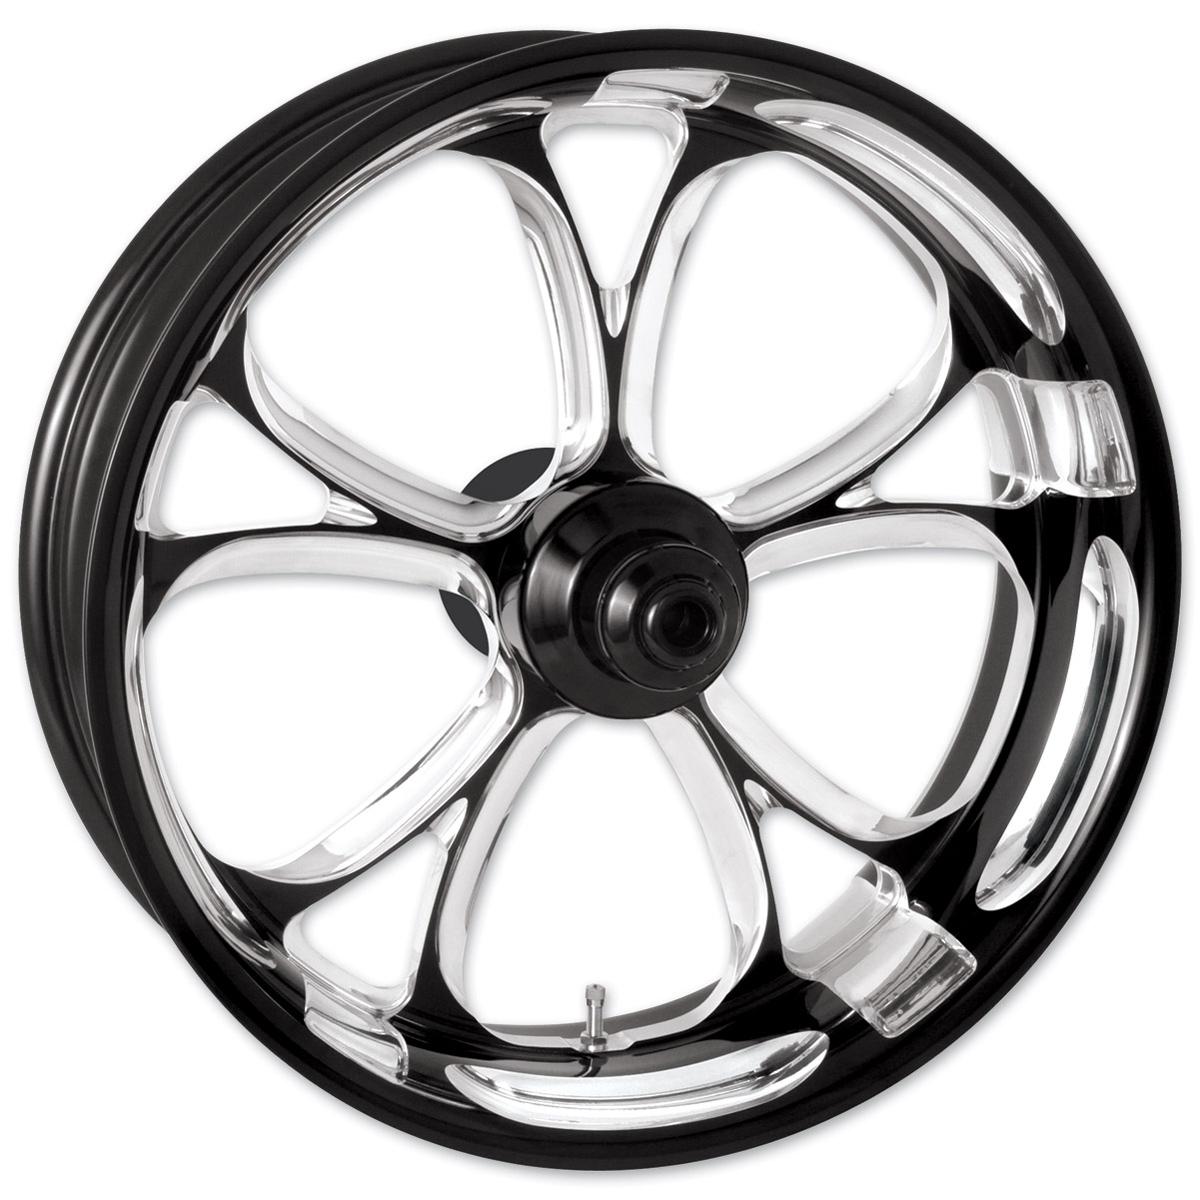 Performance Machine Luxe Platinum Cut Rear Wheel 17x6 ABS